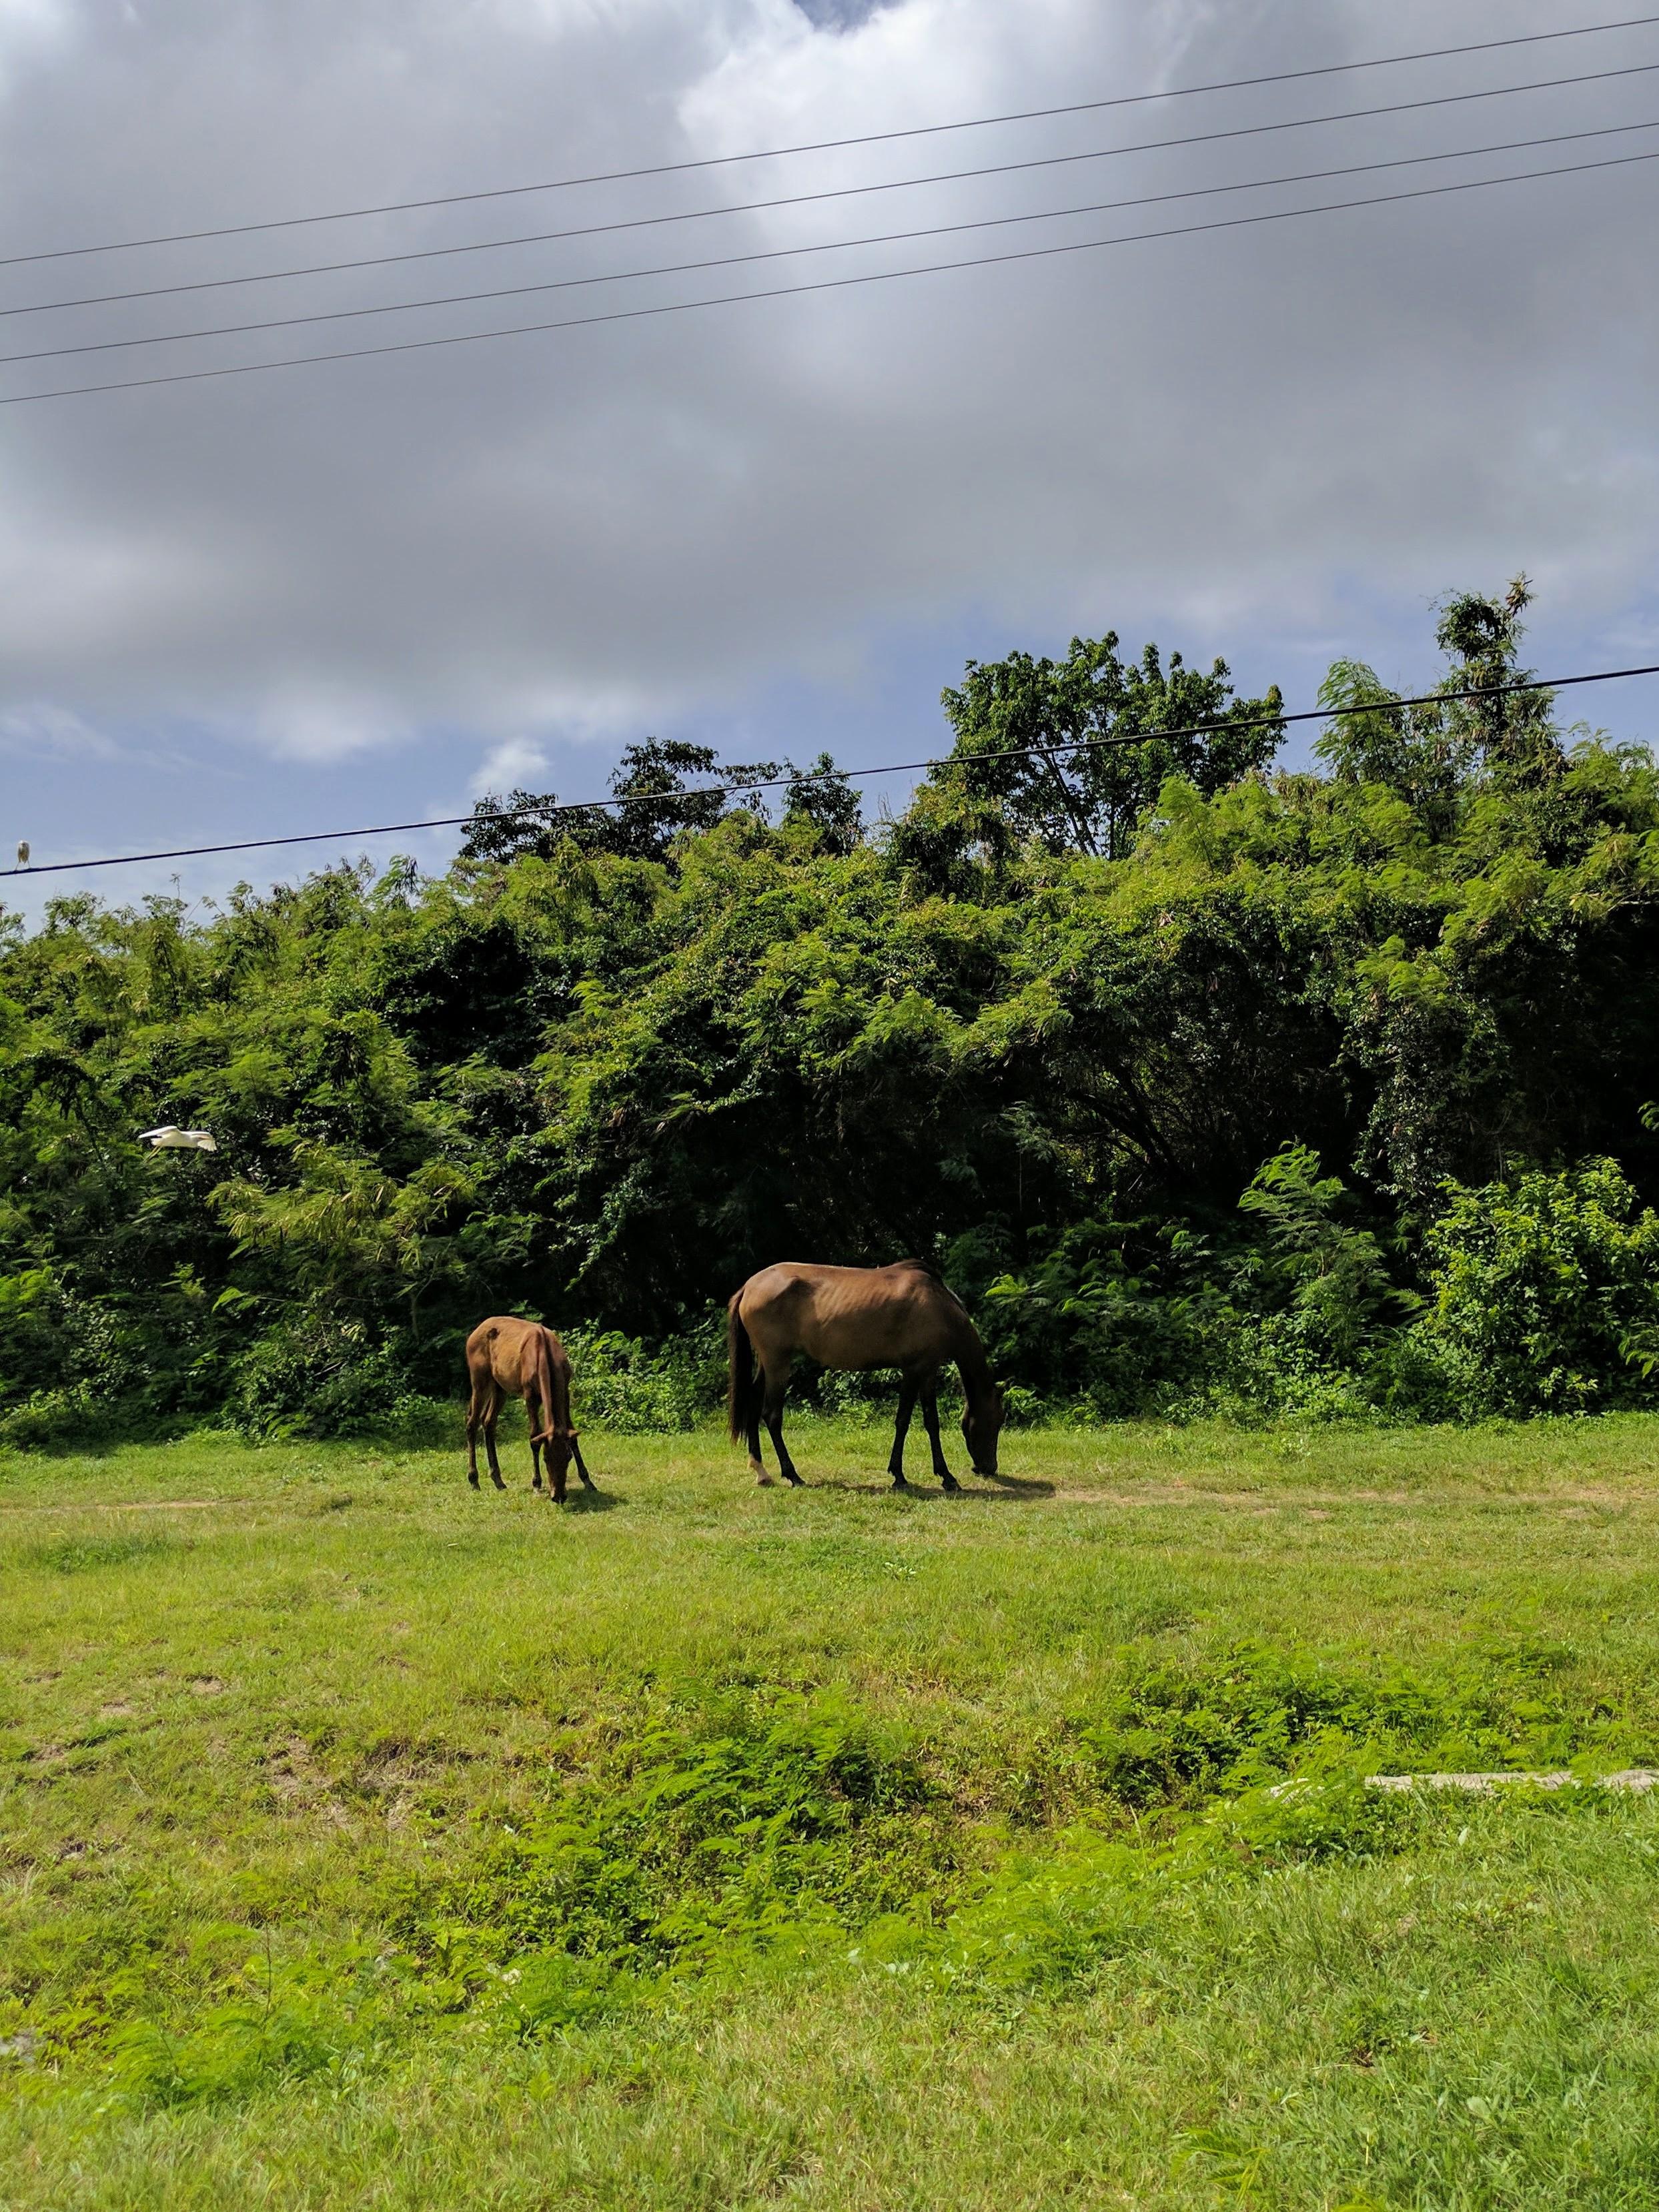 Wild horses roam the entire island of Vieques